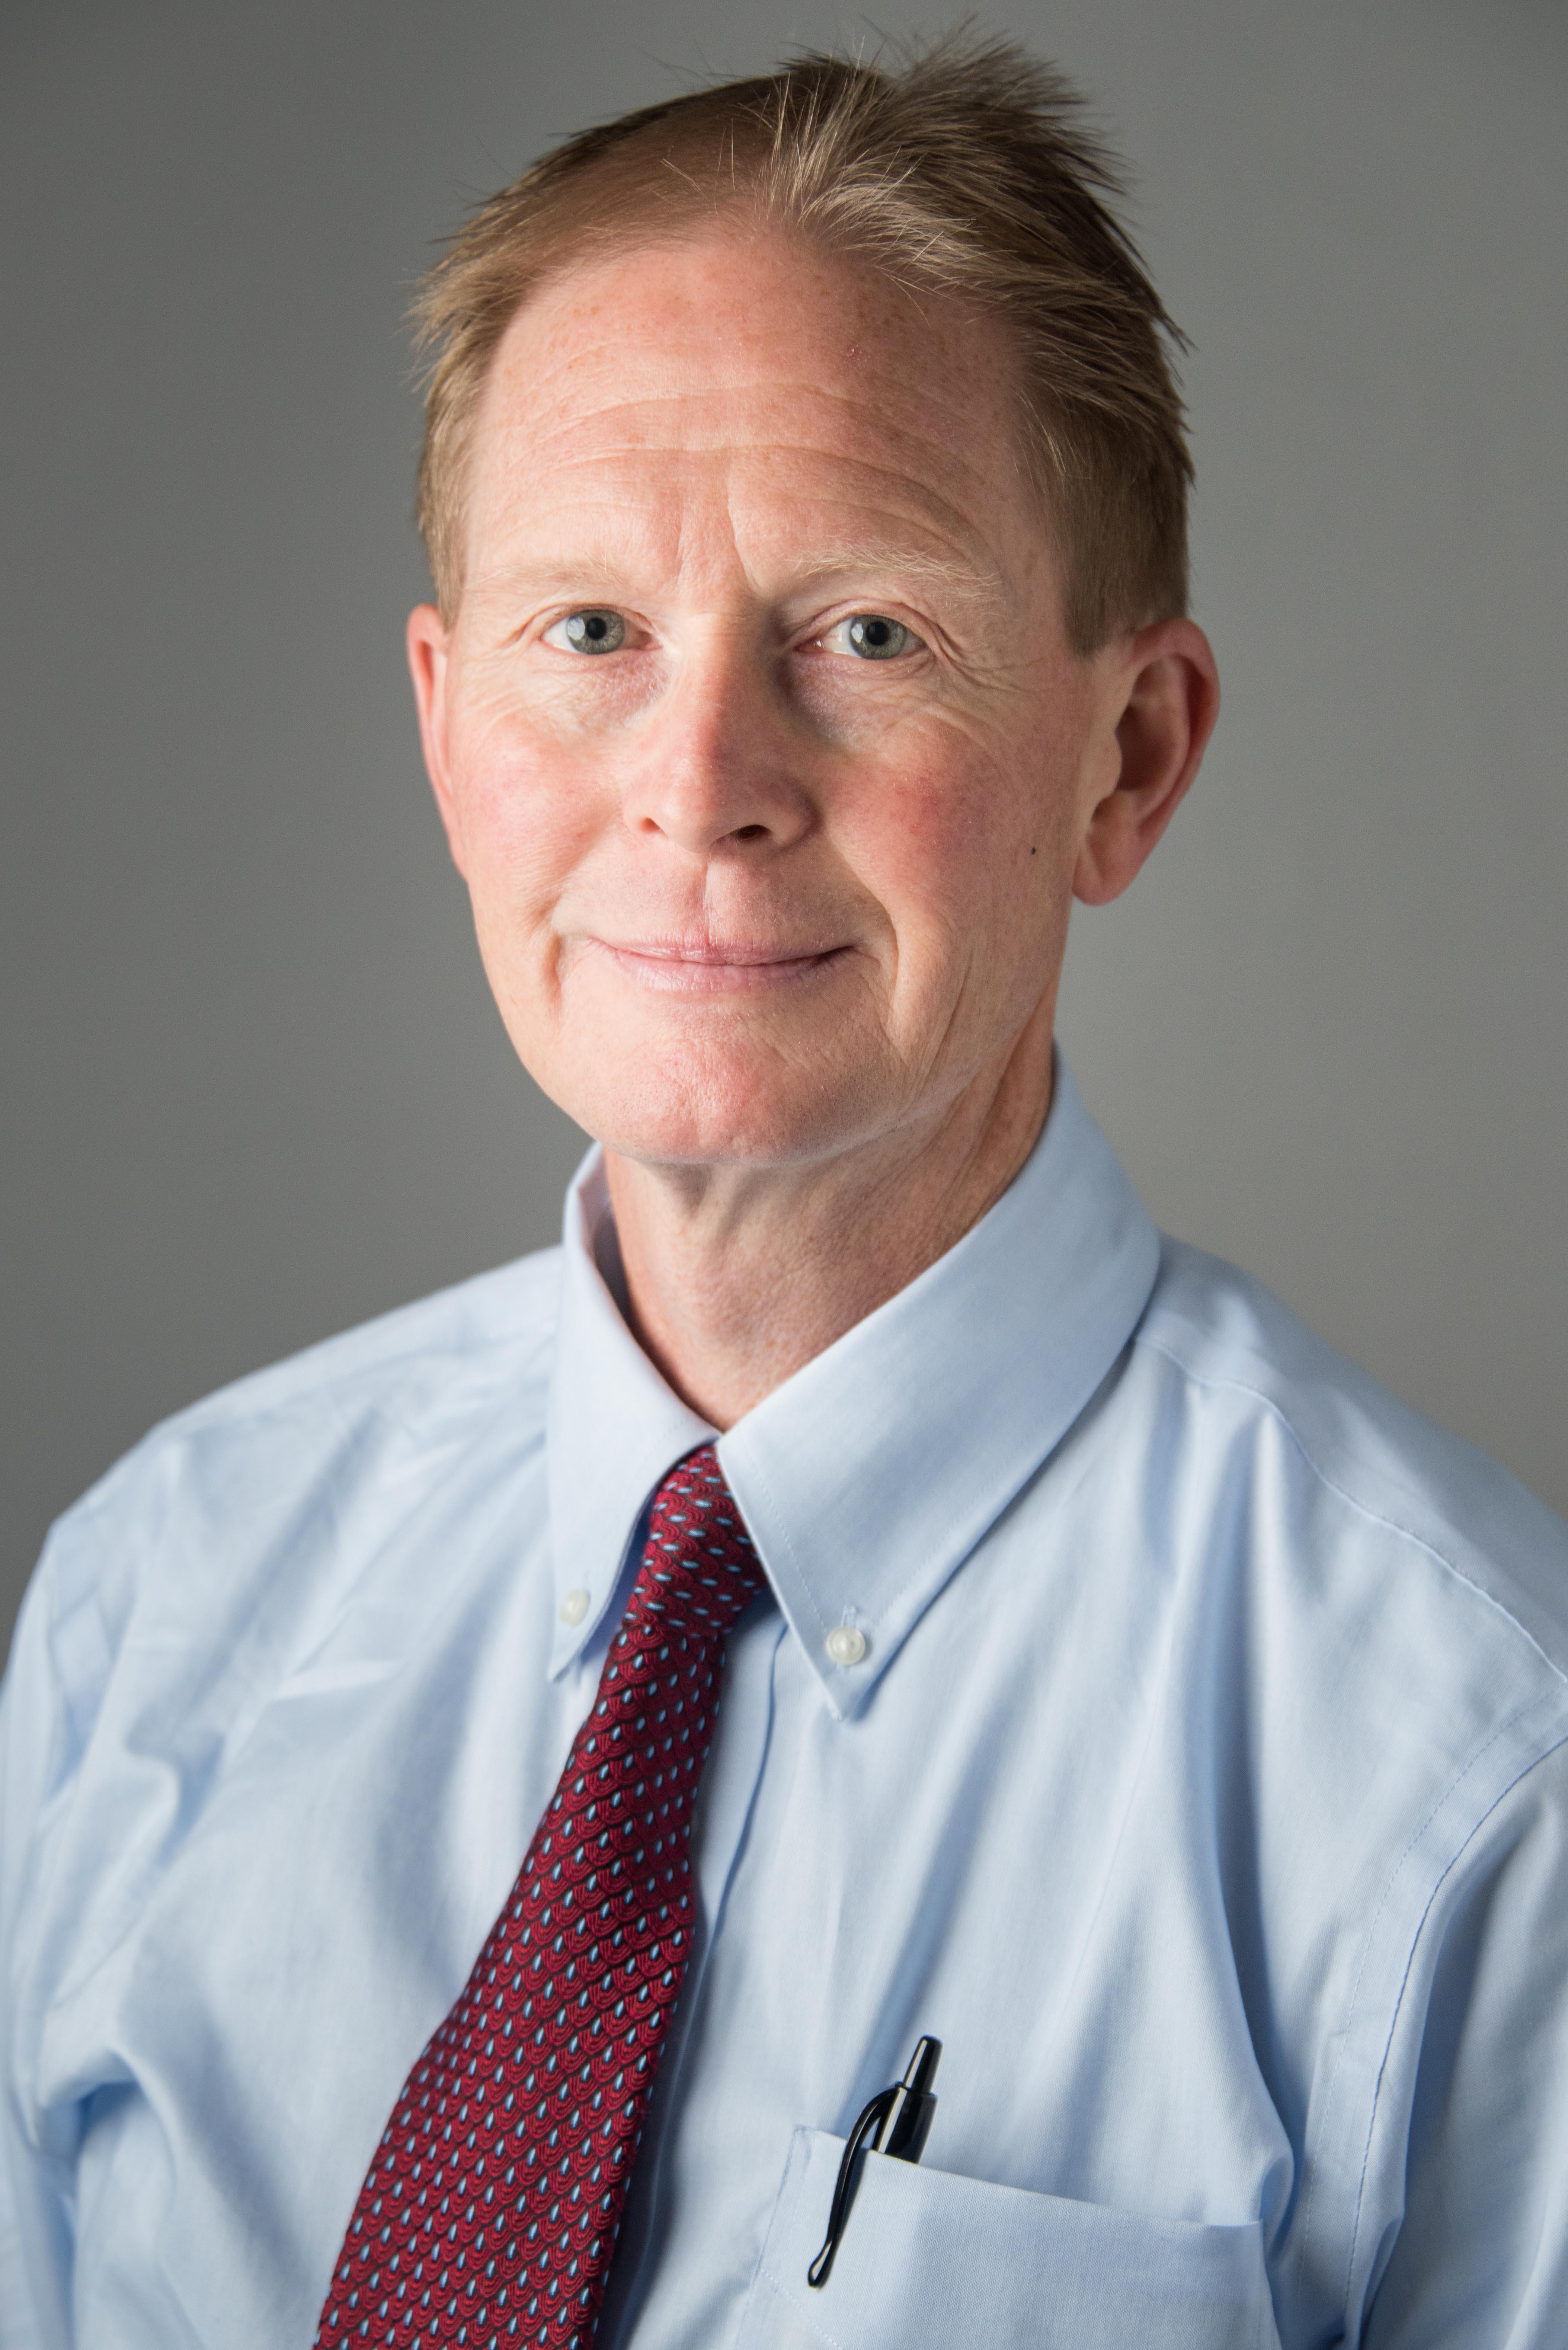 Stephen W  Behrman, MD, FACS | Faculty | Surgery | UTHSC